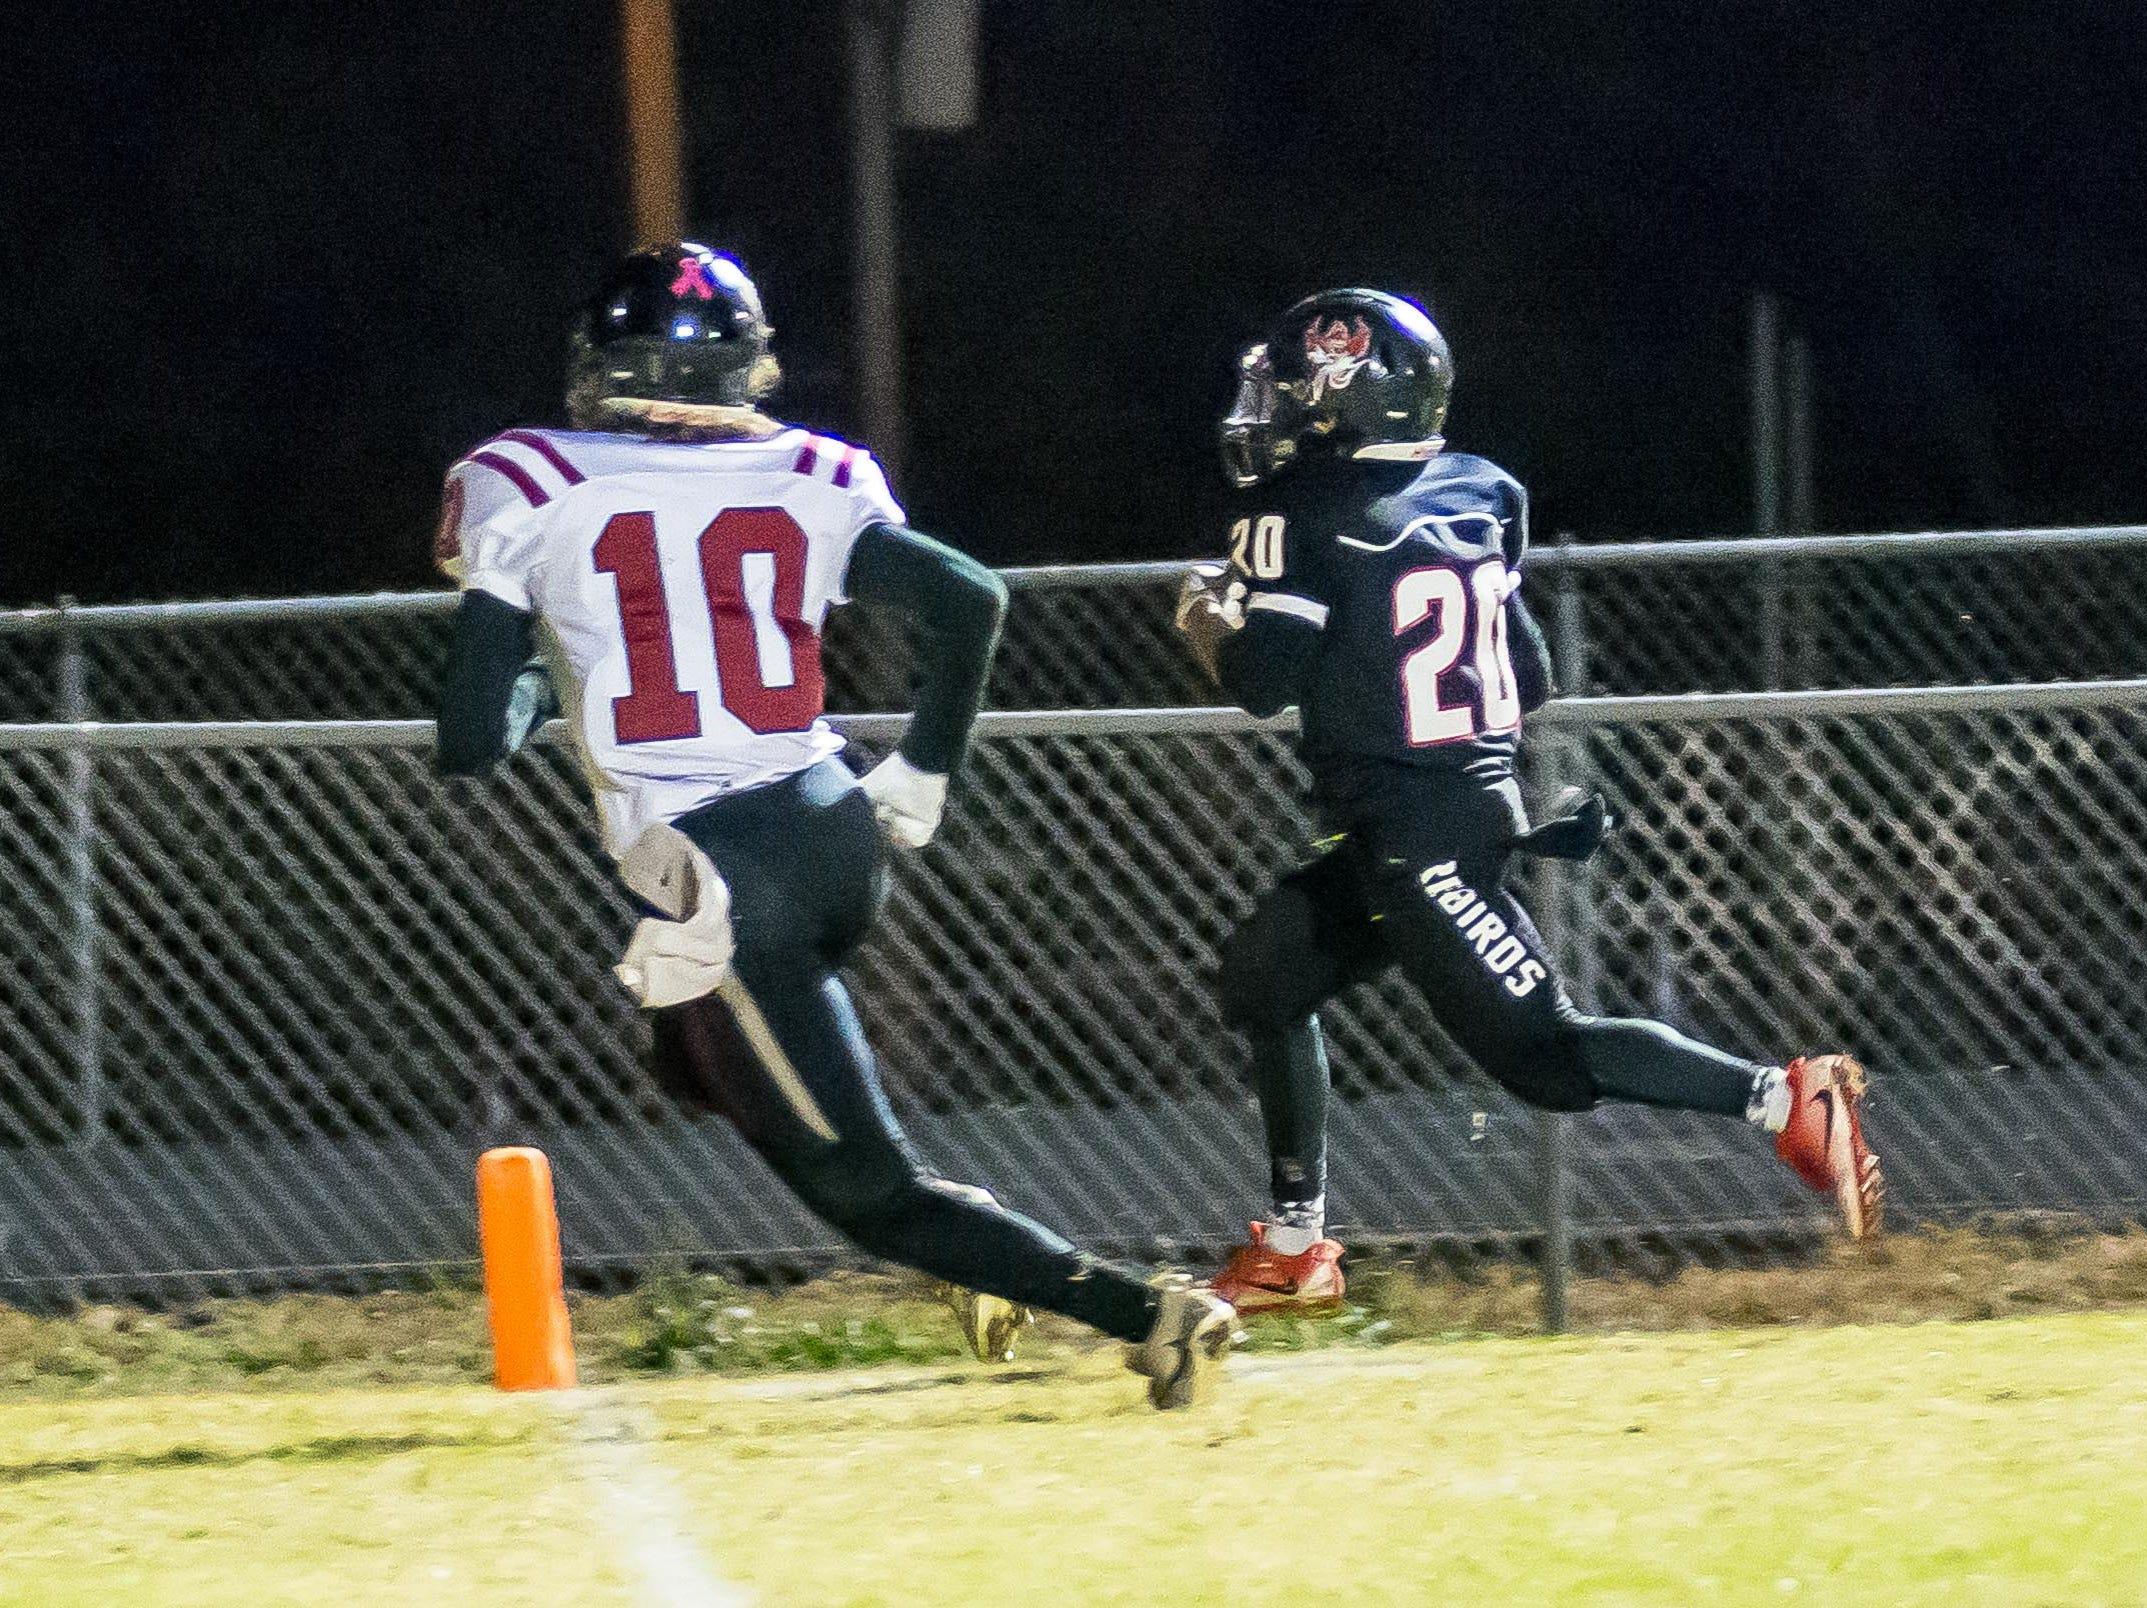 Iven Dayton runs in a 1-yard touchdown.